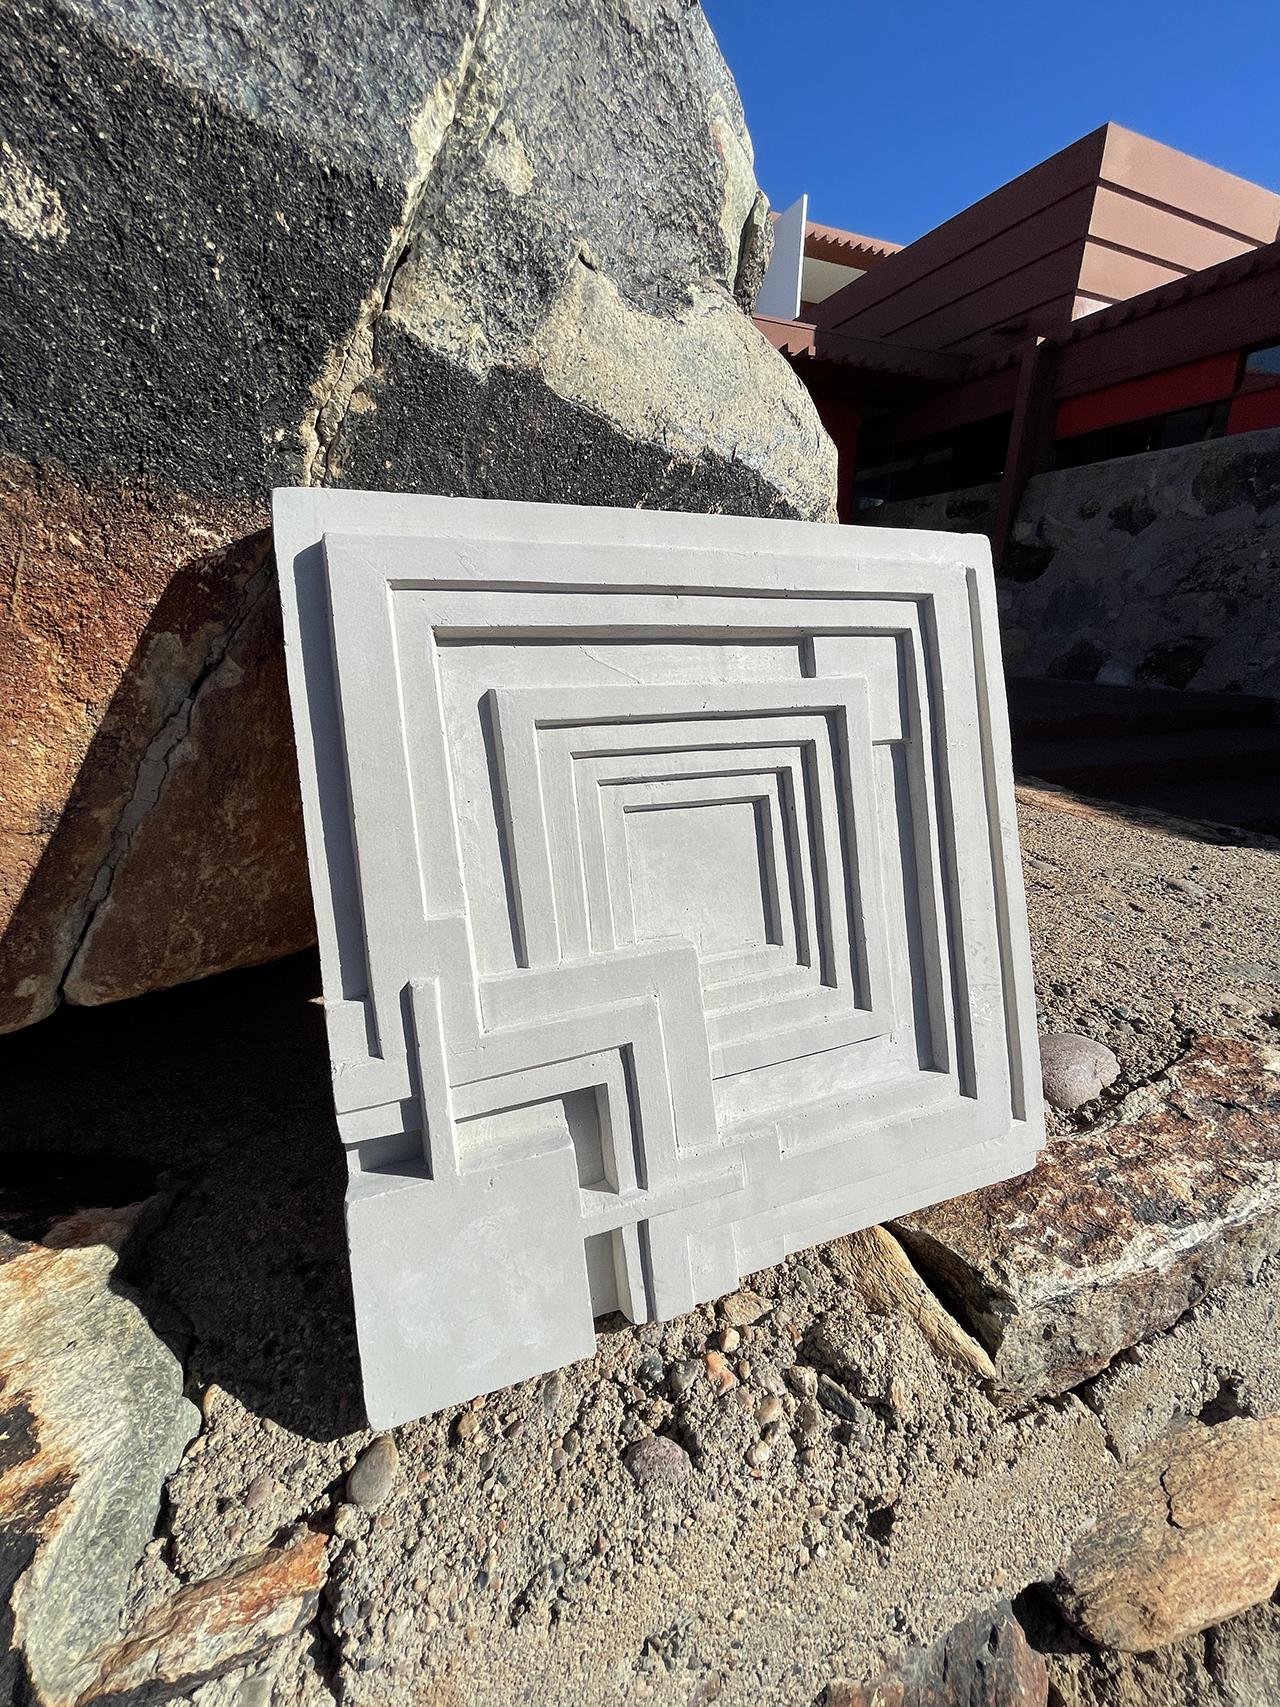 Ennis Cement Tile sitting on stone